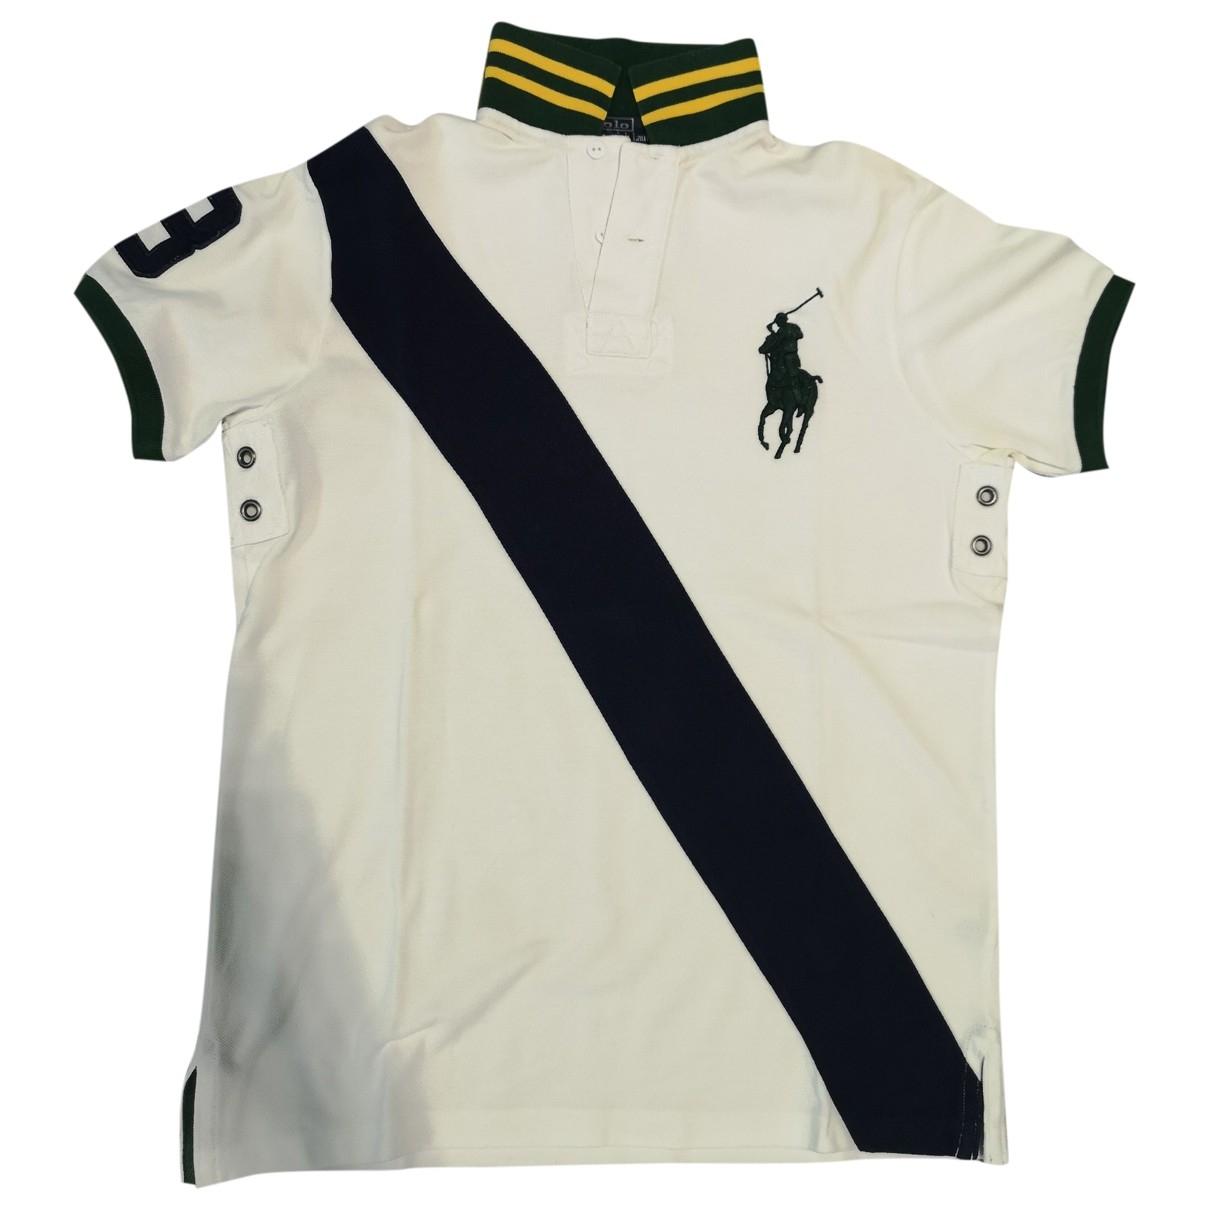 Polo Ralph Lauren - Polos Polo cintre manches courtes pour homme en coton - blanc